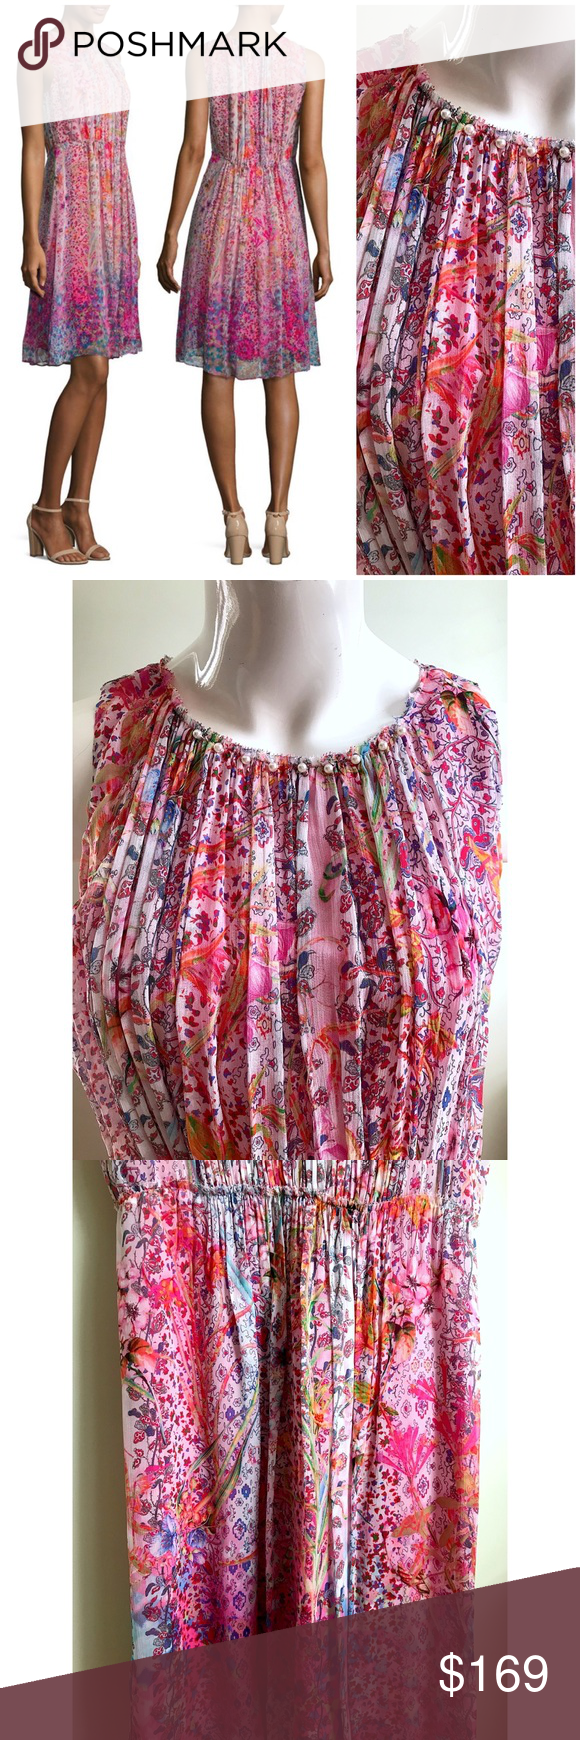 7853e42a6fc8 Elie Tahari Demetria Pleated Floral Silk Dress Elie Tahari Demetria Pleated  Floral Silk Dress Gooseberry Pink